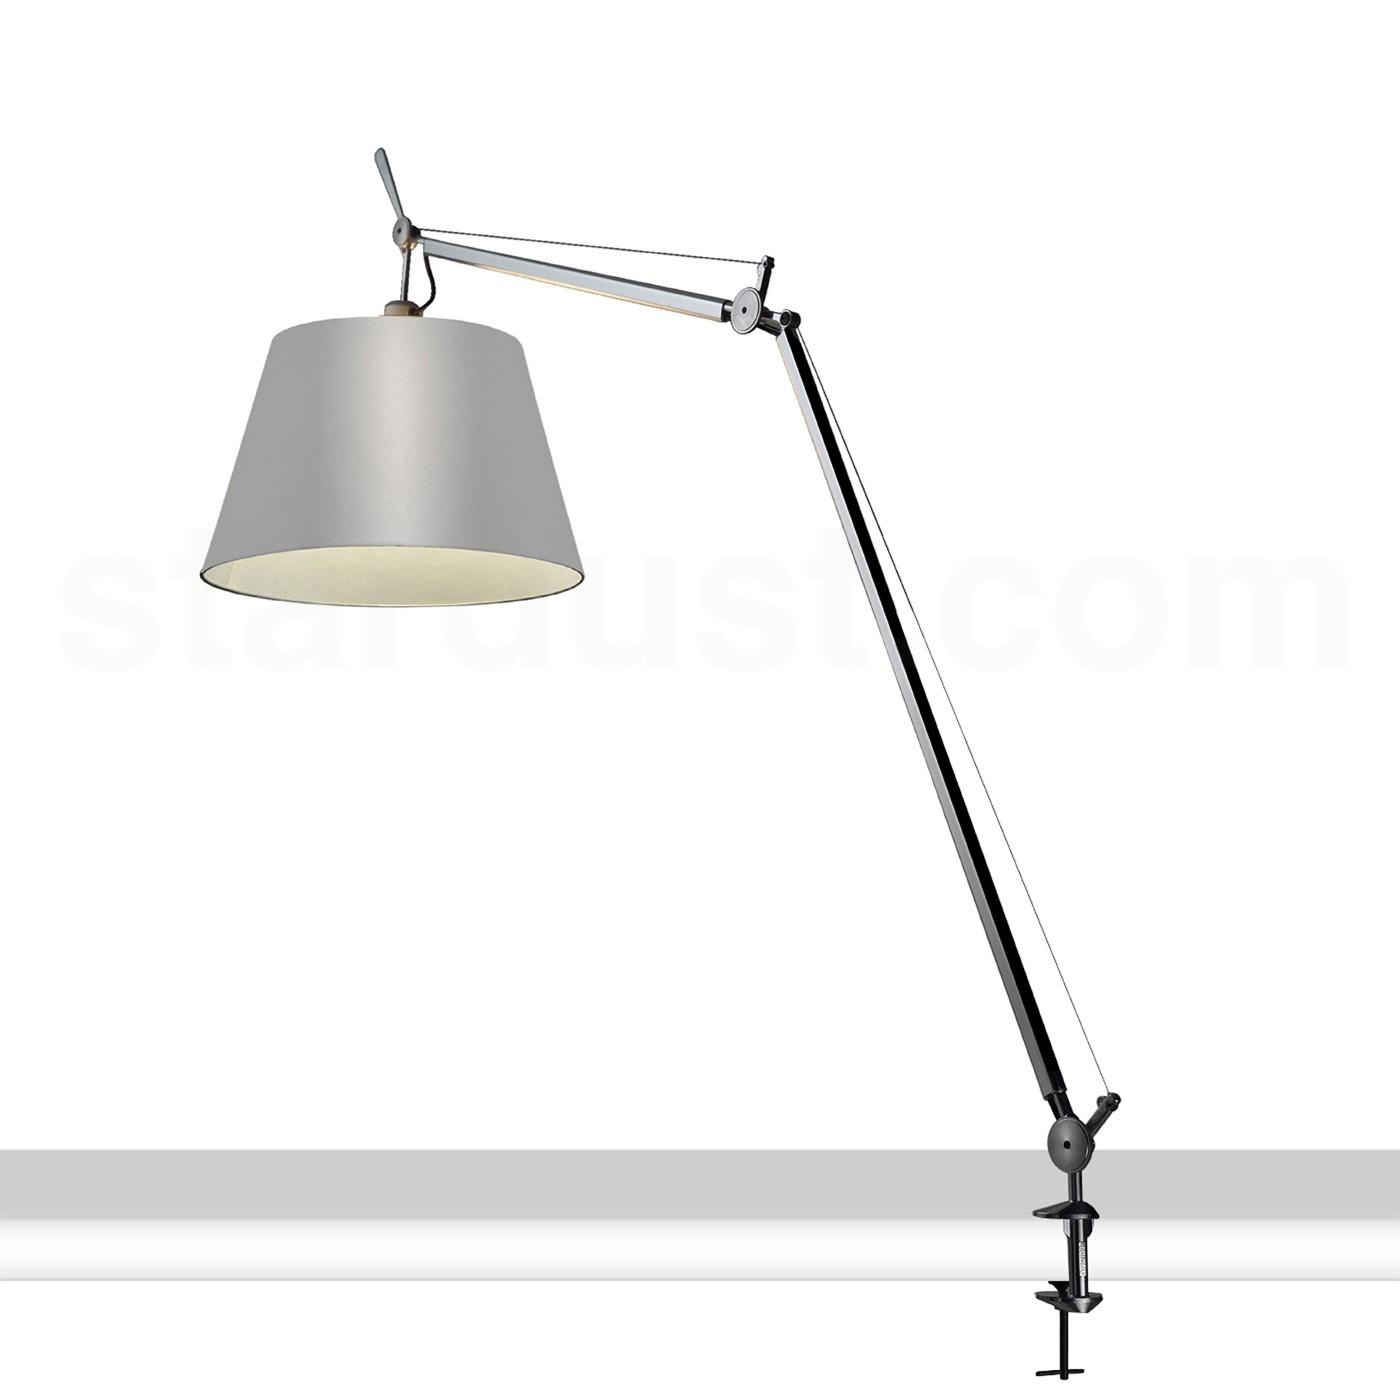 Tolomeo mega lampada da tavolo artemide acquista online deplai - Lampada da tavolo tolomeo ...